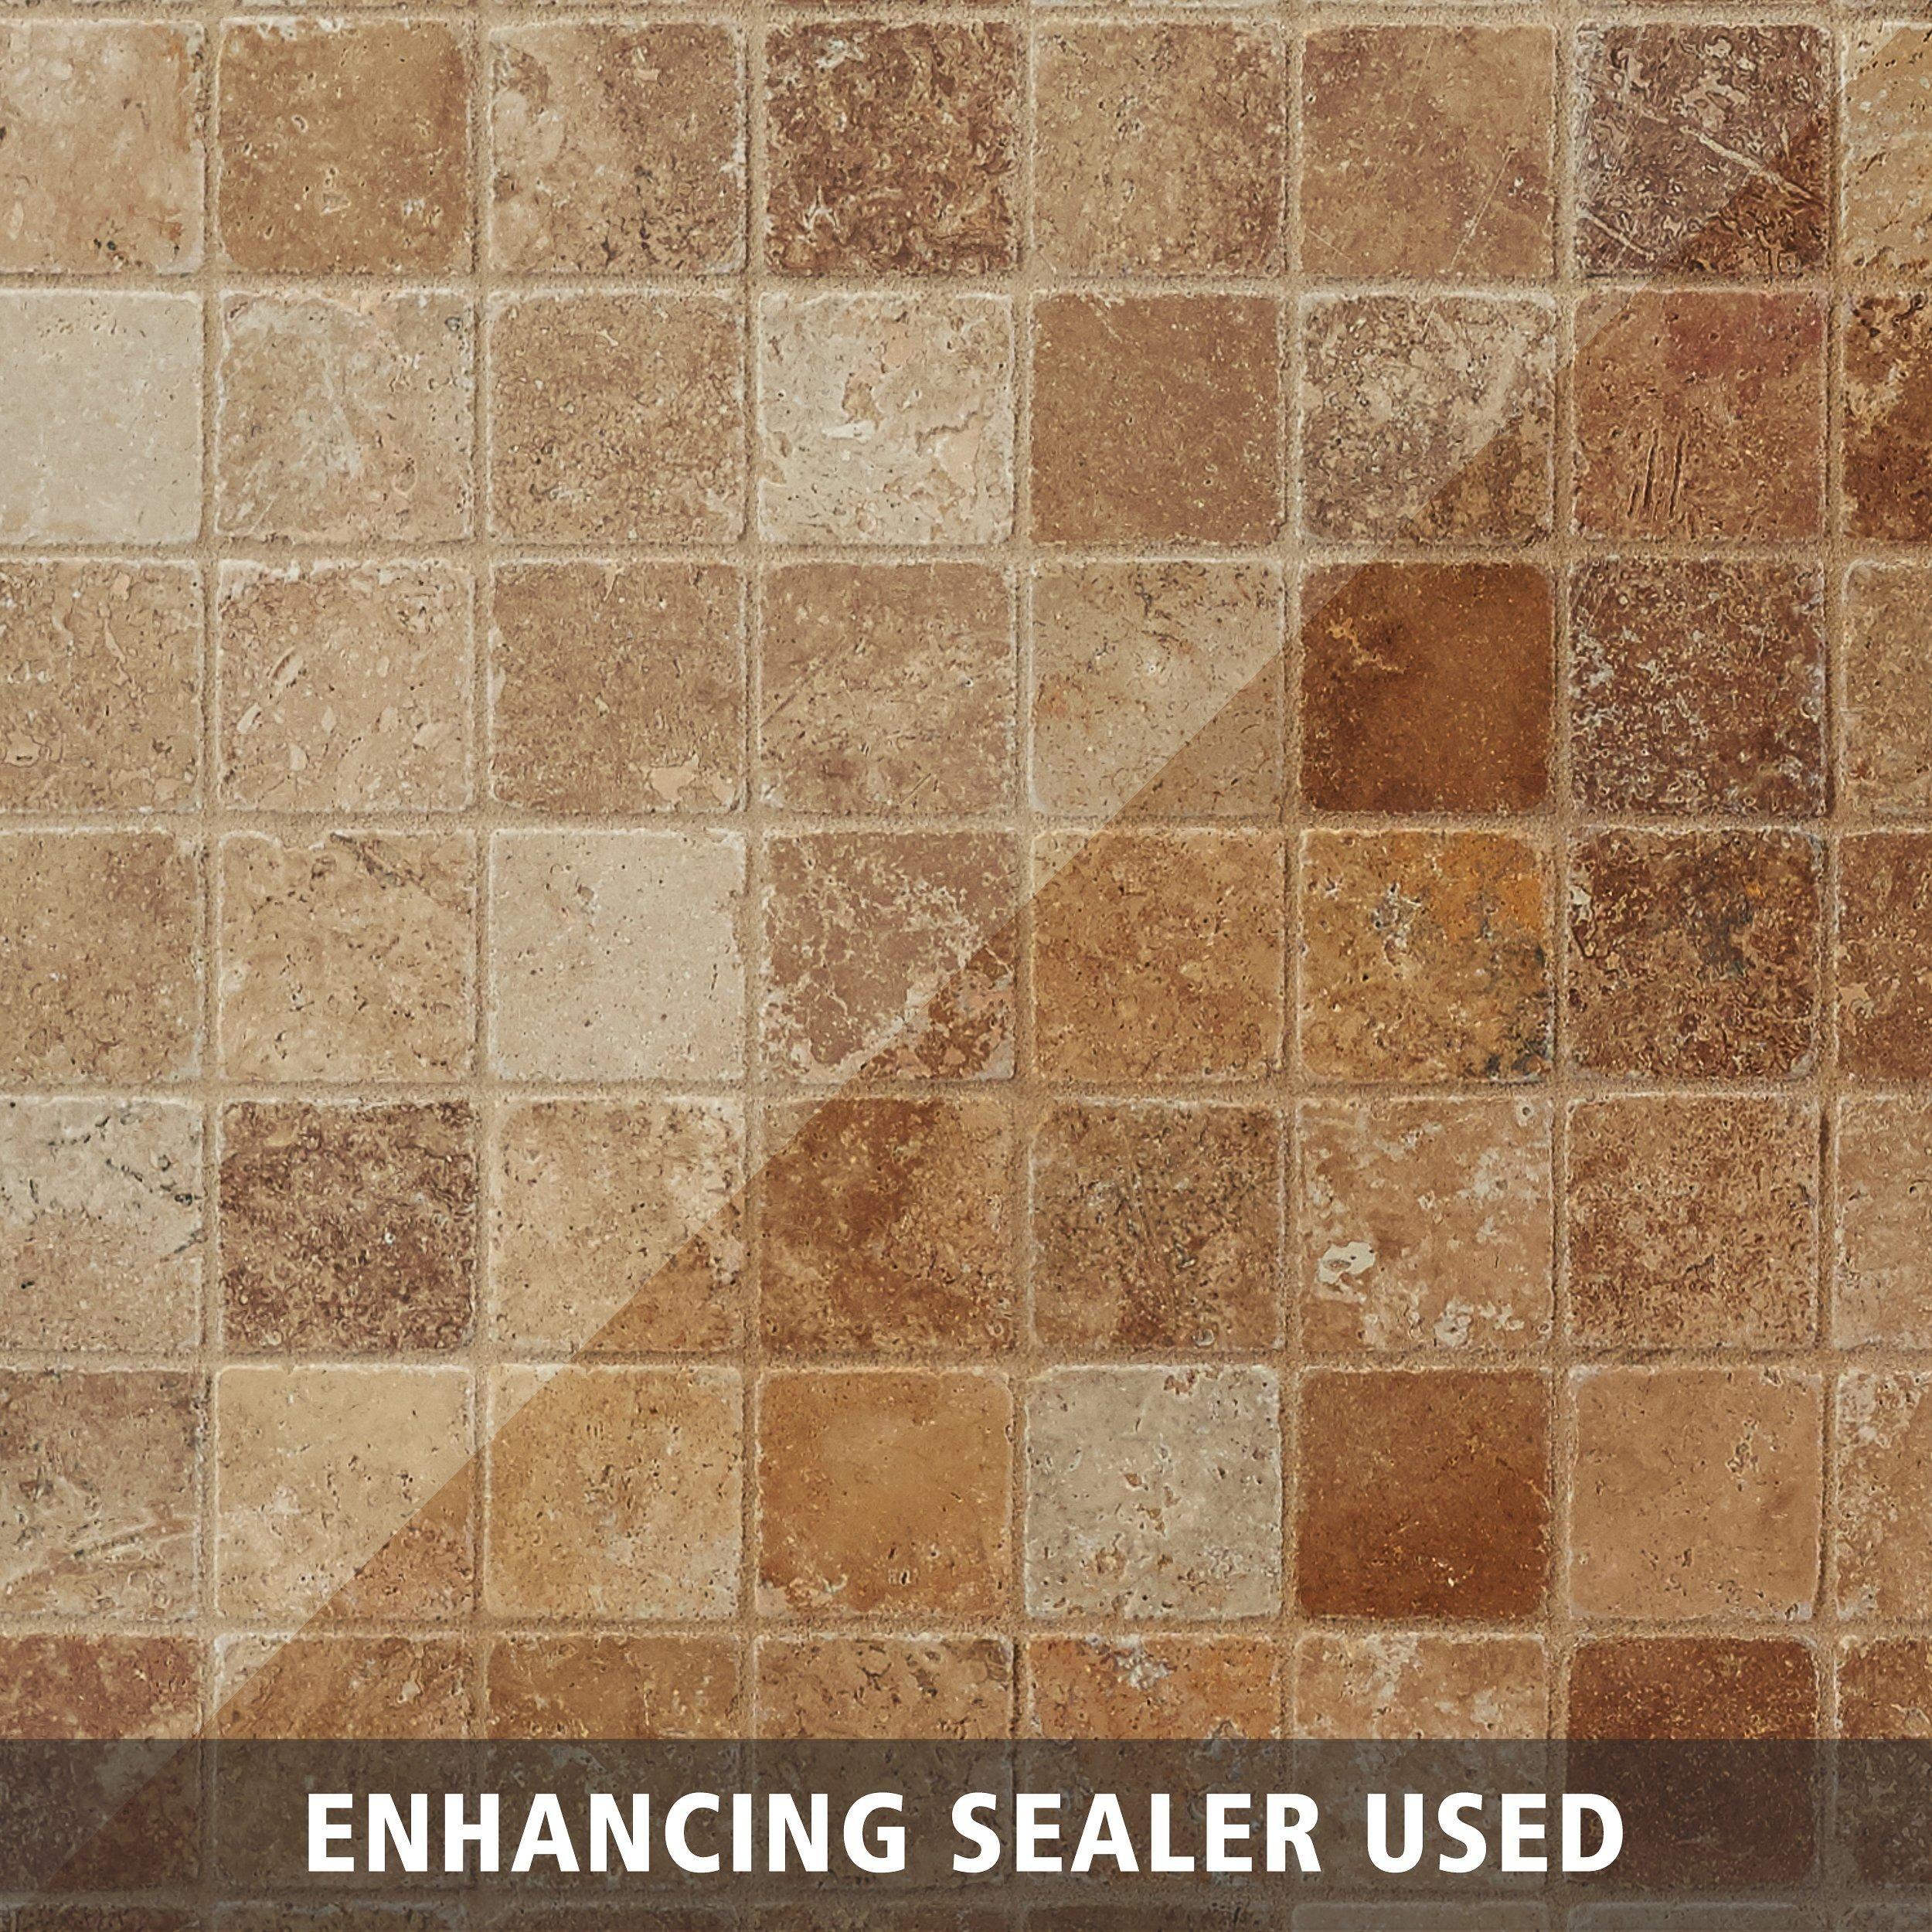 - Noce Travertine Mosaic Flooring, Travertine, Decorative Tile